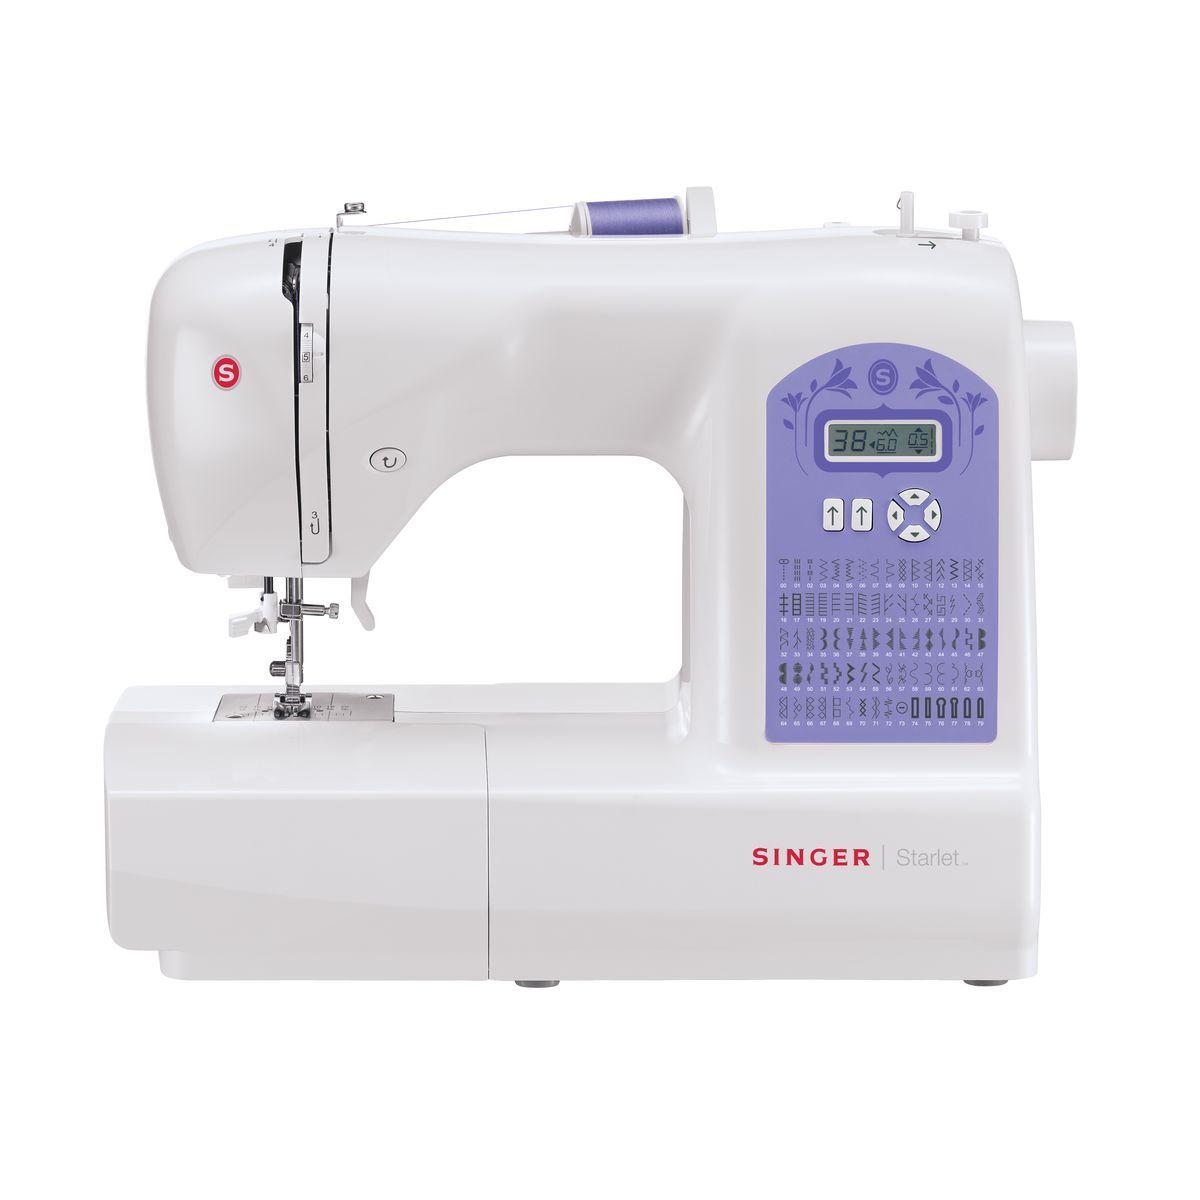 Machine à coudre STARLET 6680 - Blanc